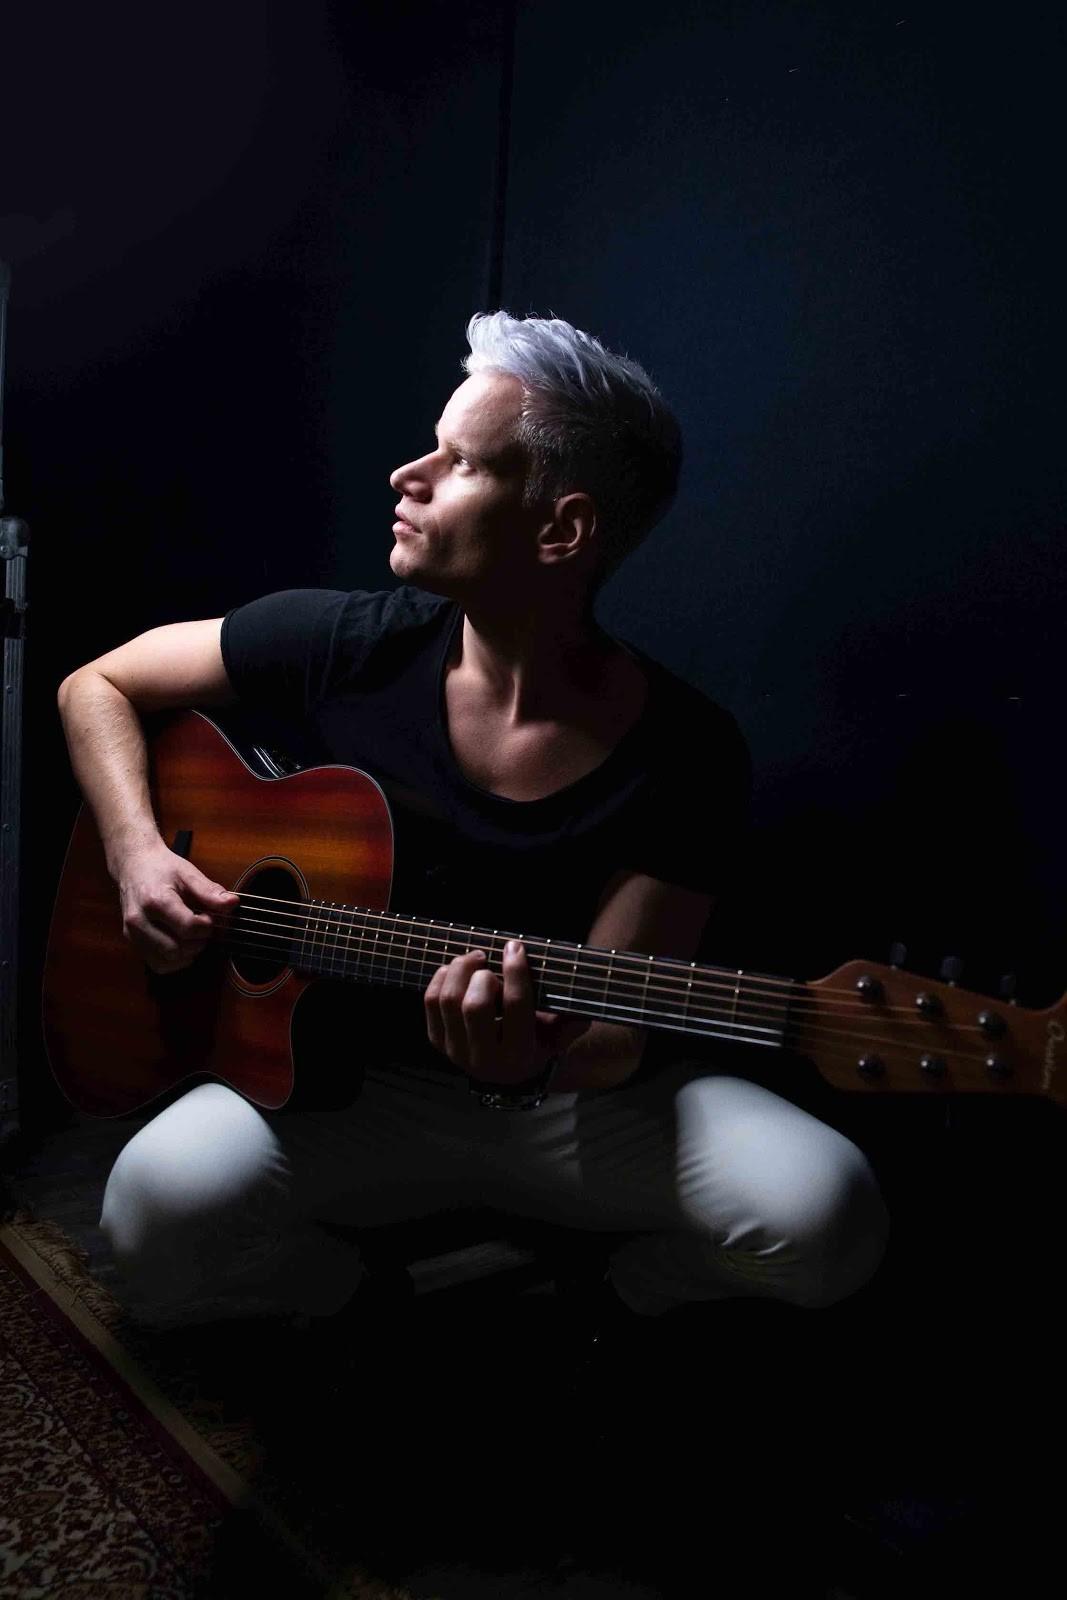 Vigorous Drop From Swedish Artist Alex Alexander – EP Titled 'Helpless'